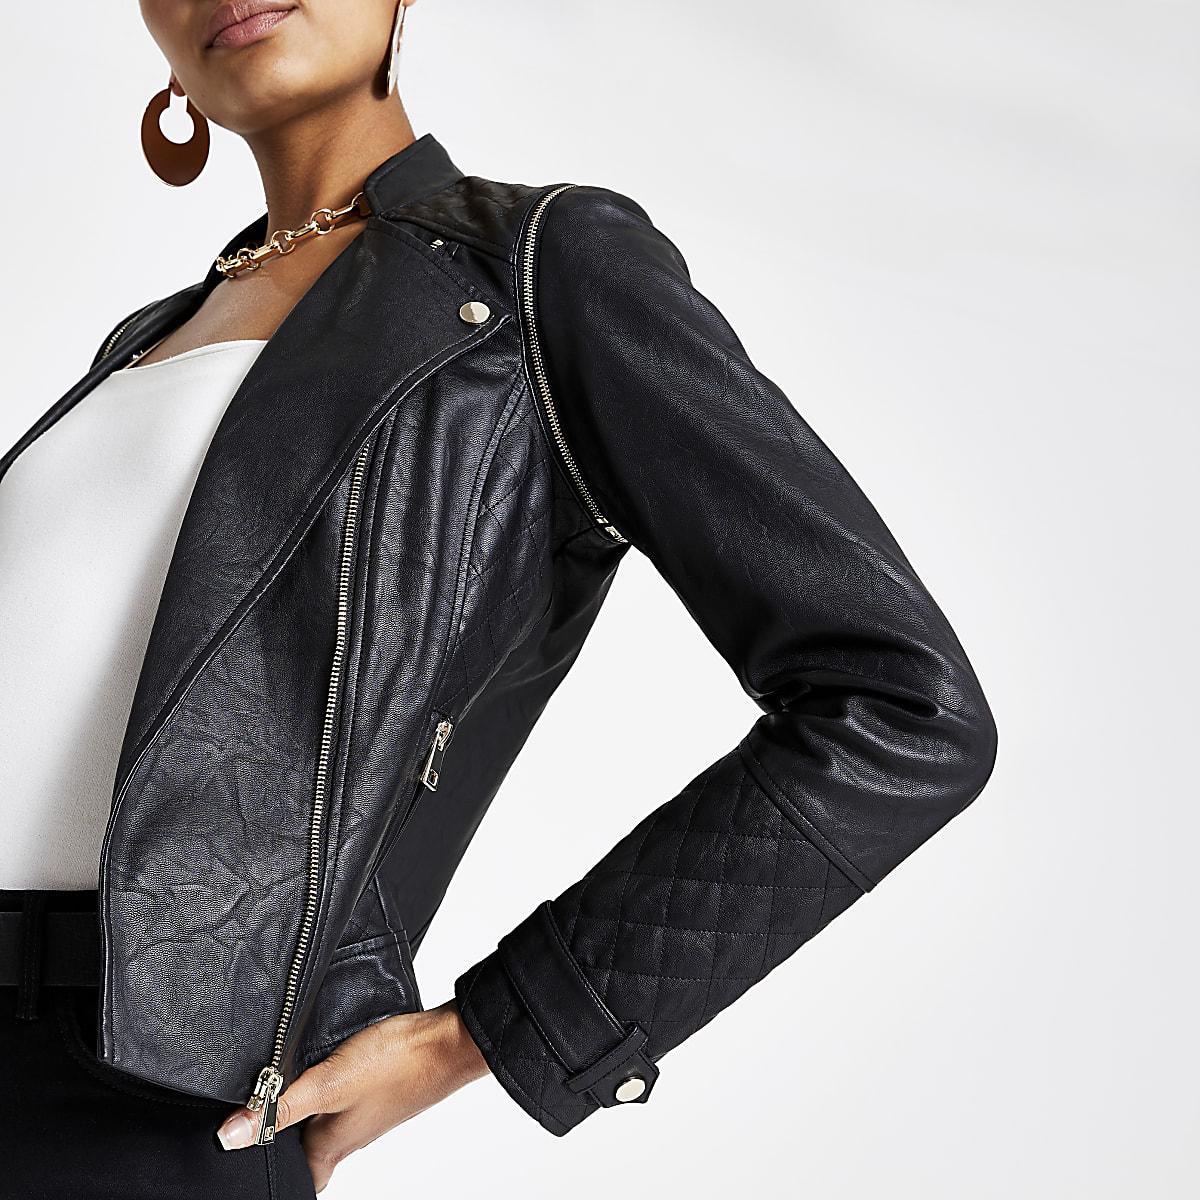 Perfecto ajusté imitation cuir noir